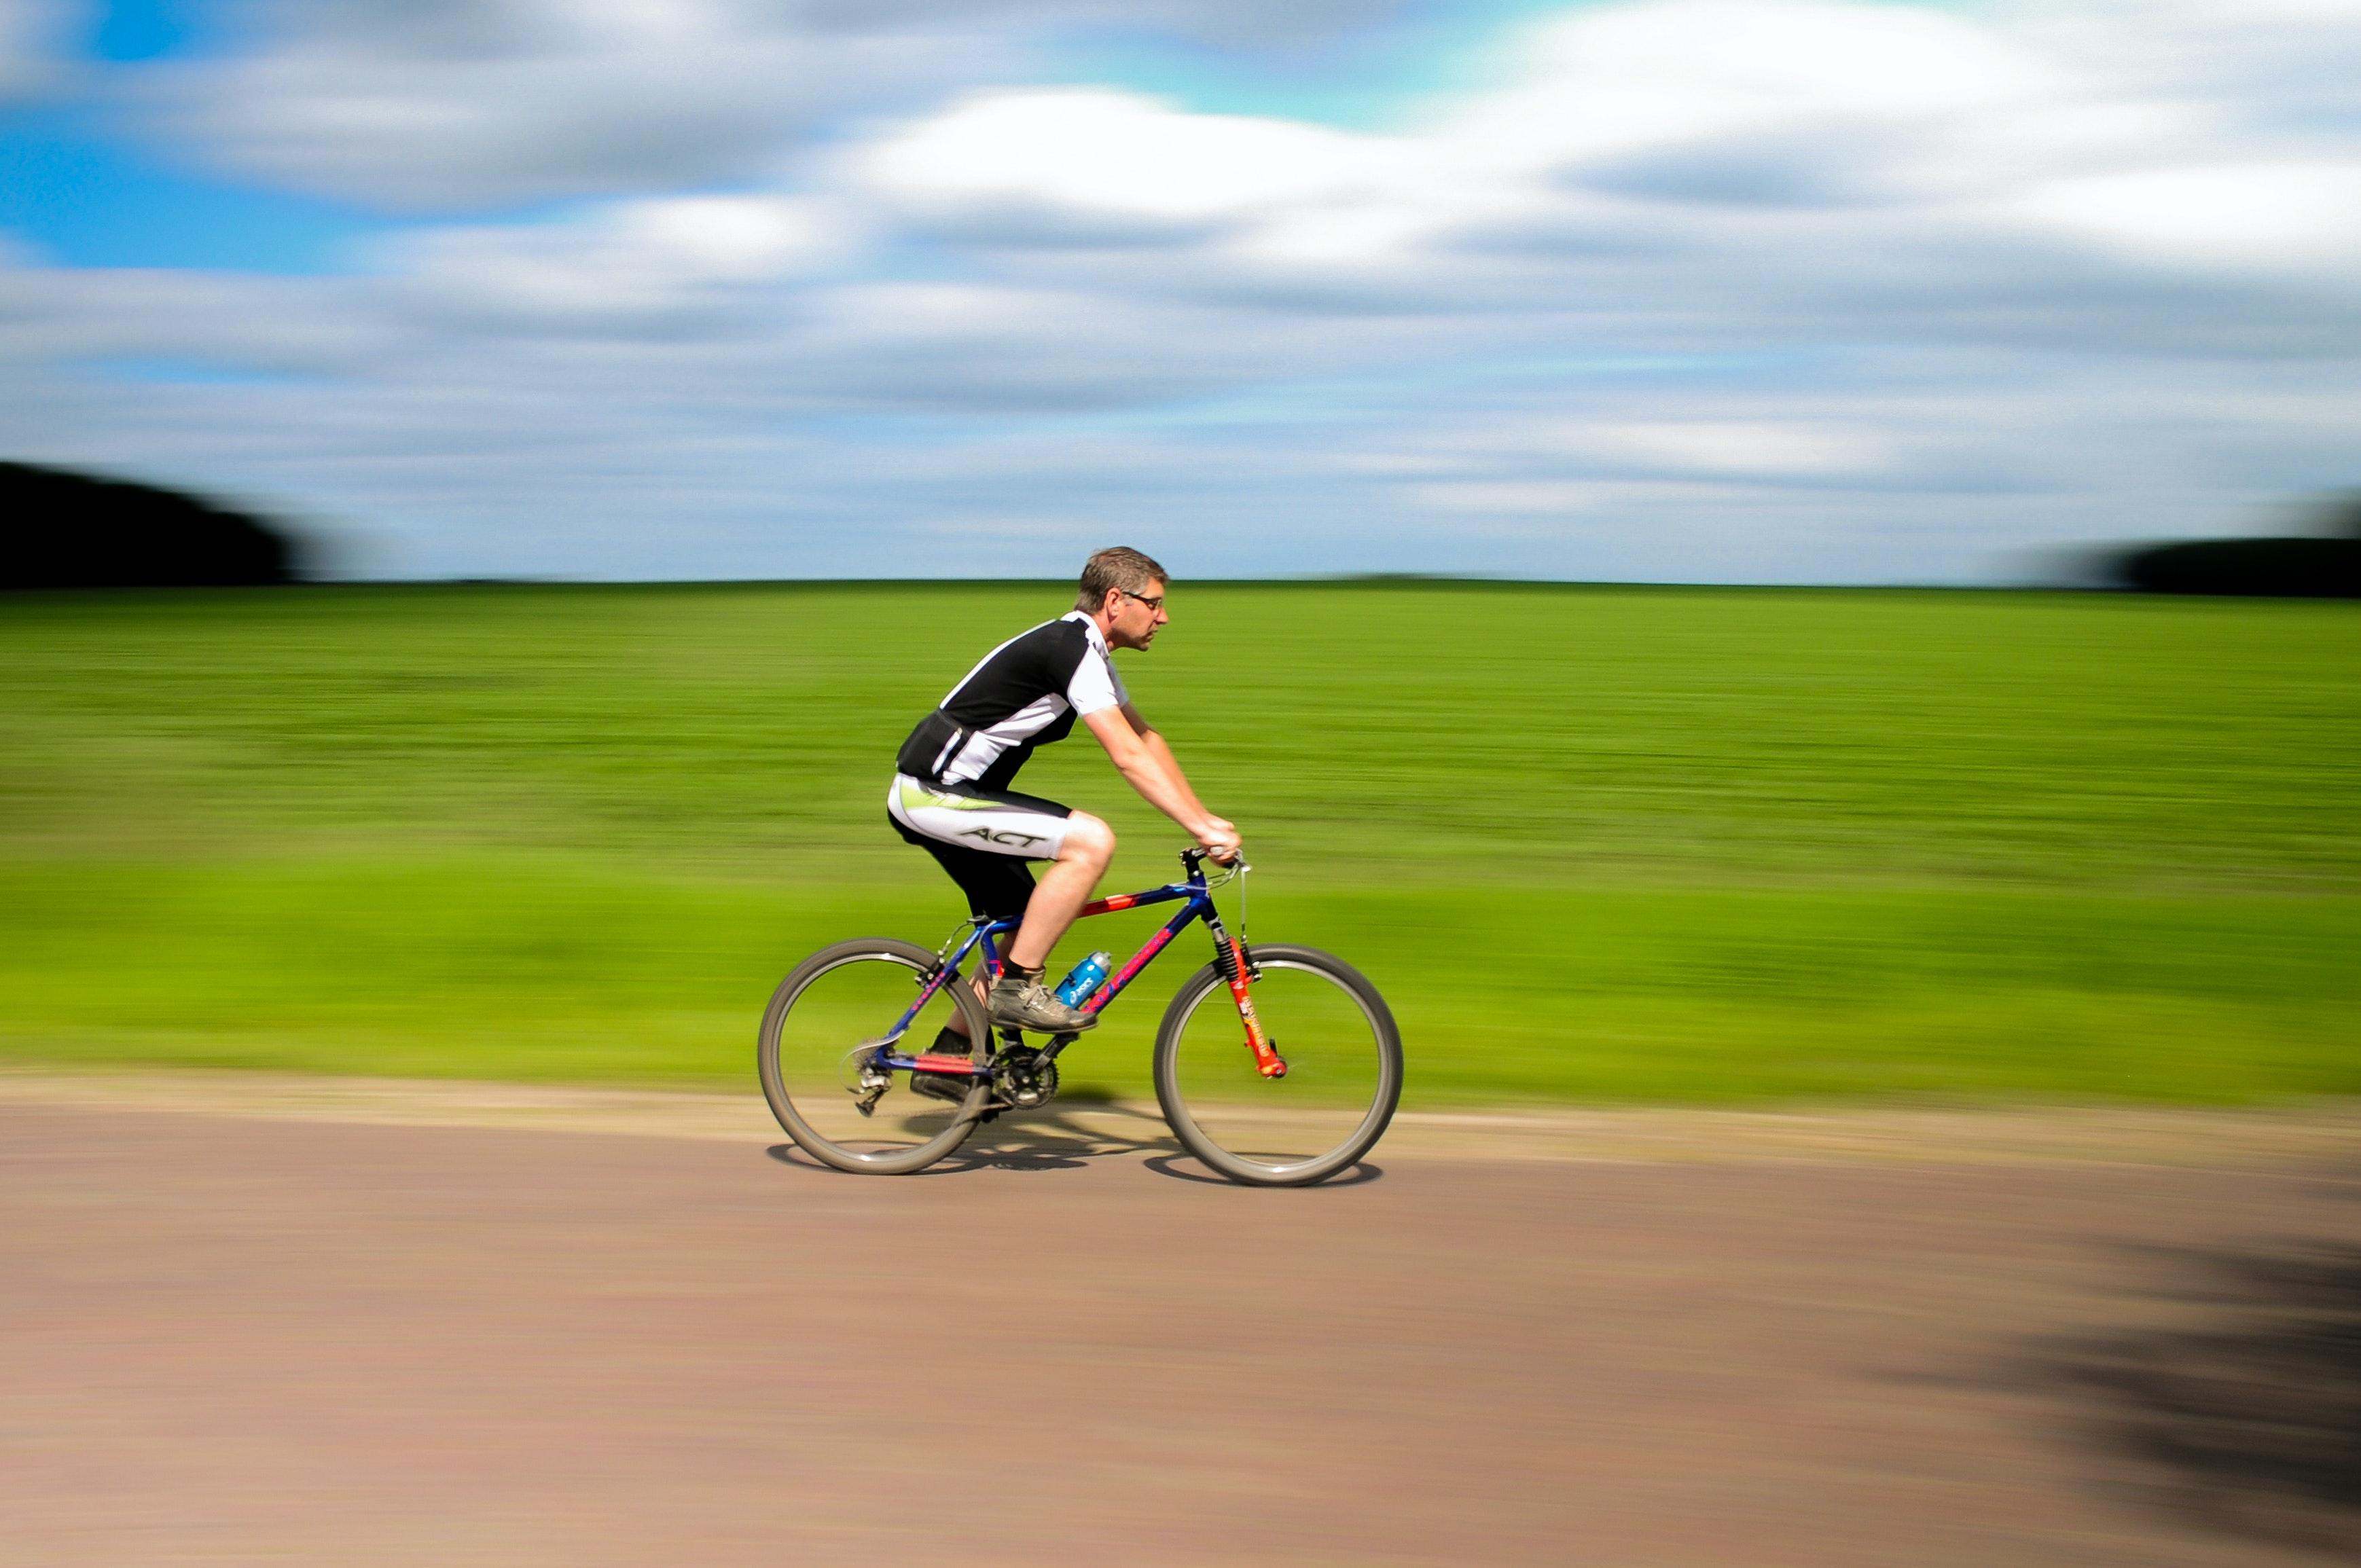 beautiful sportsman photos · pexels · free stock photos